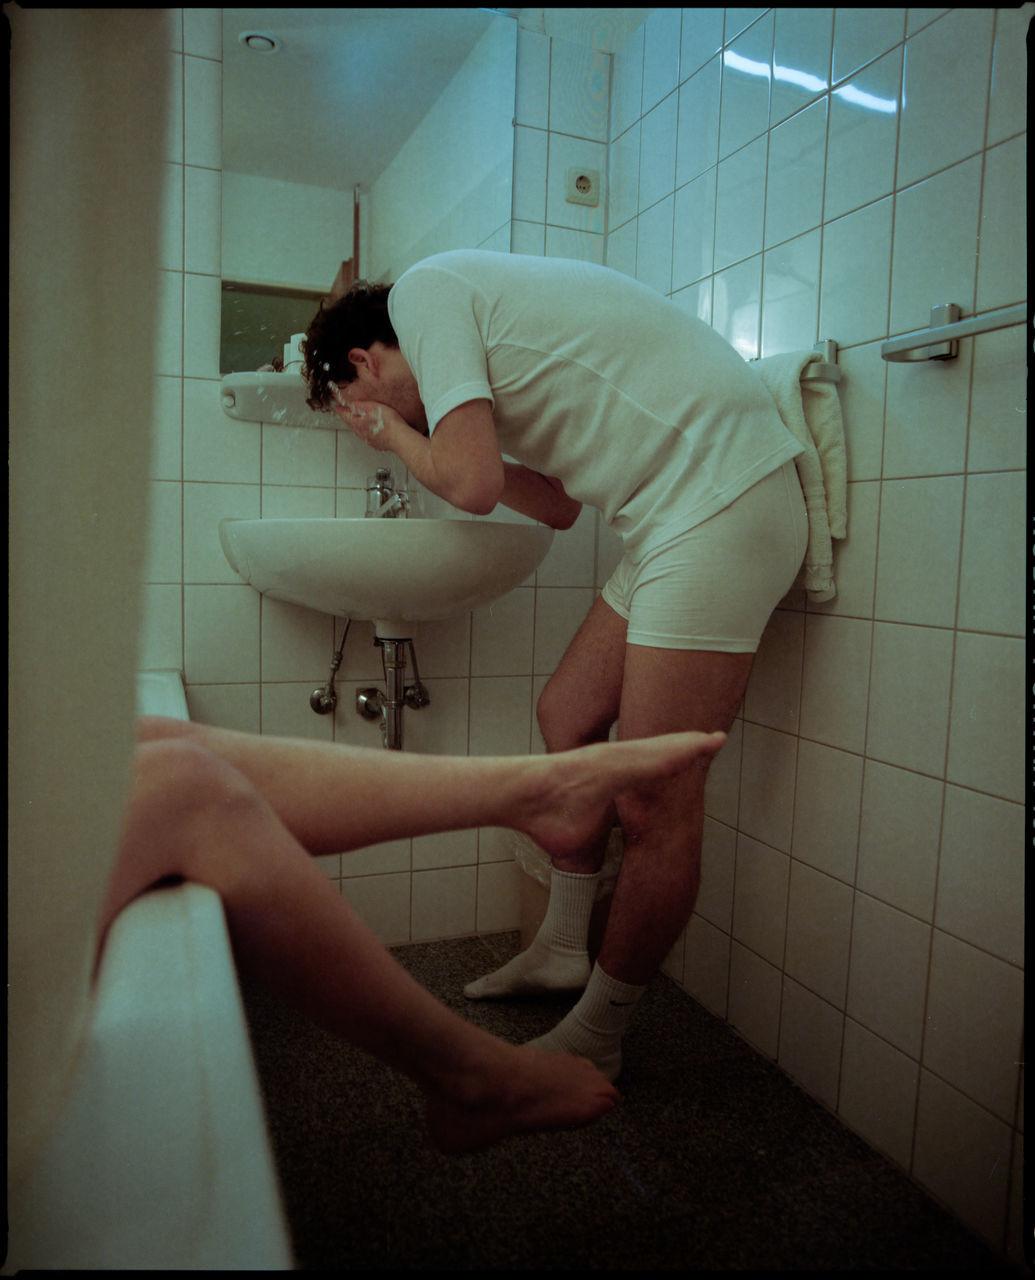 SIDE VIEW OF MAN IN BATHROOM